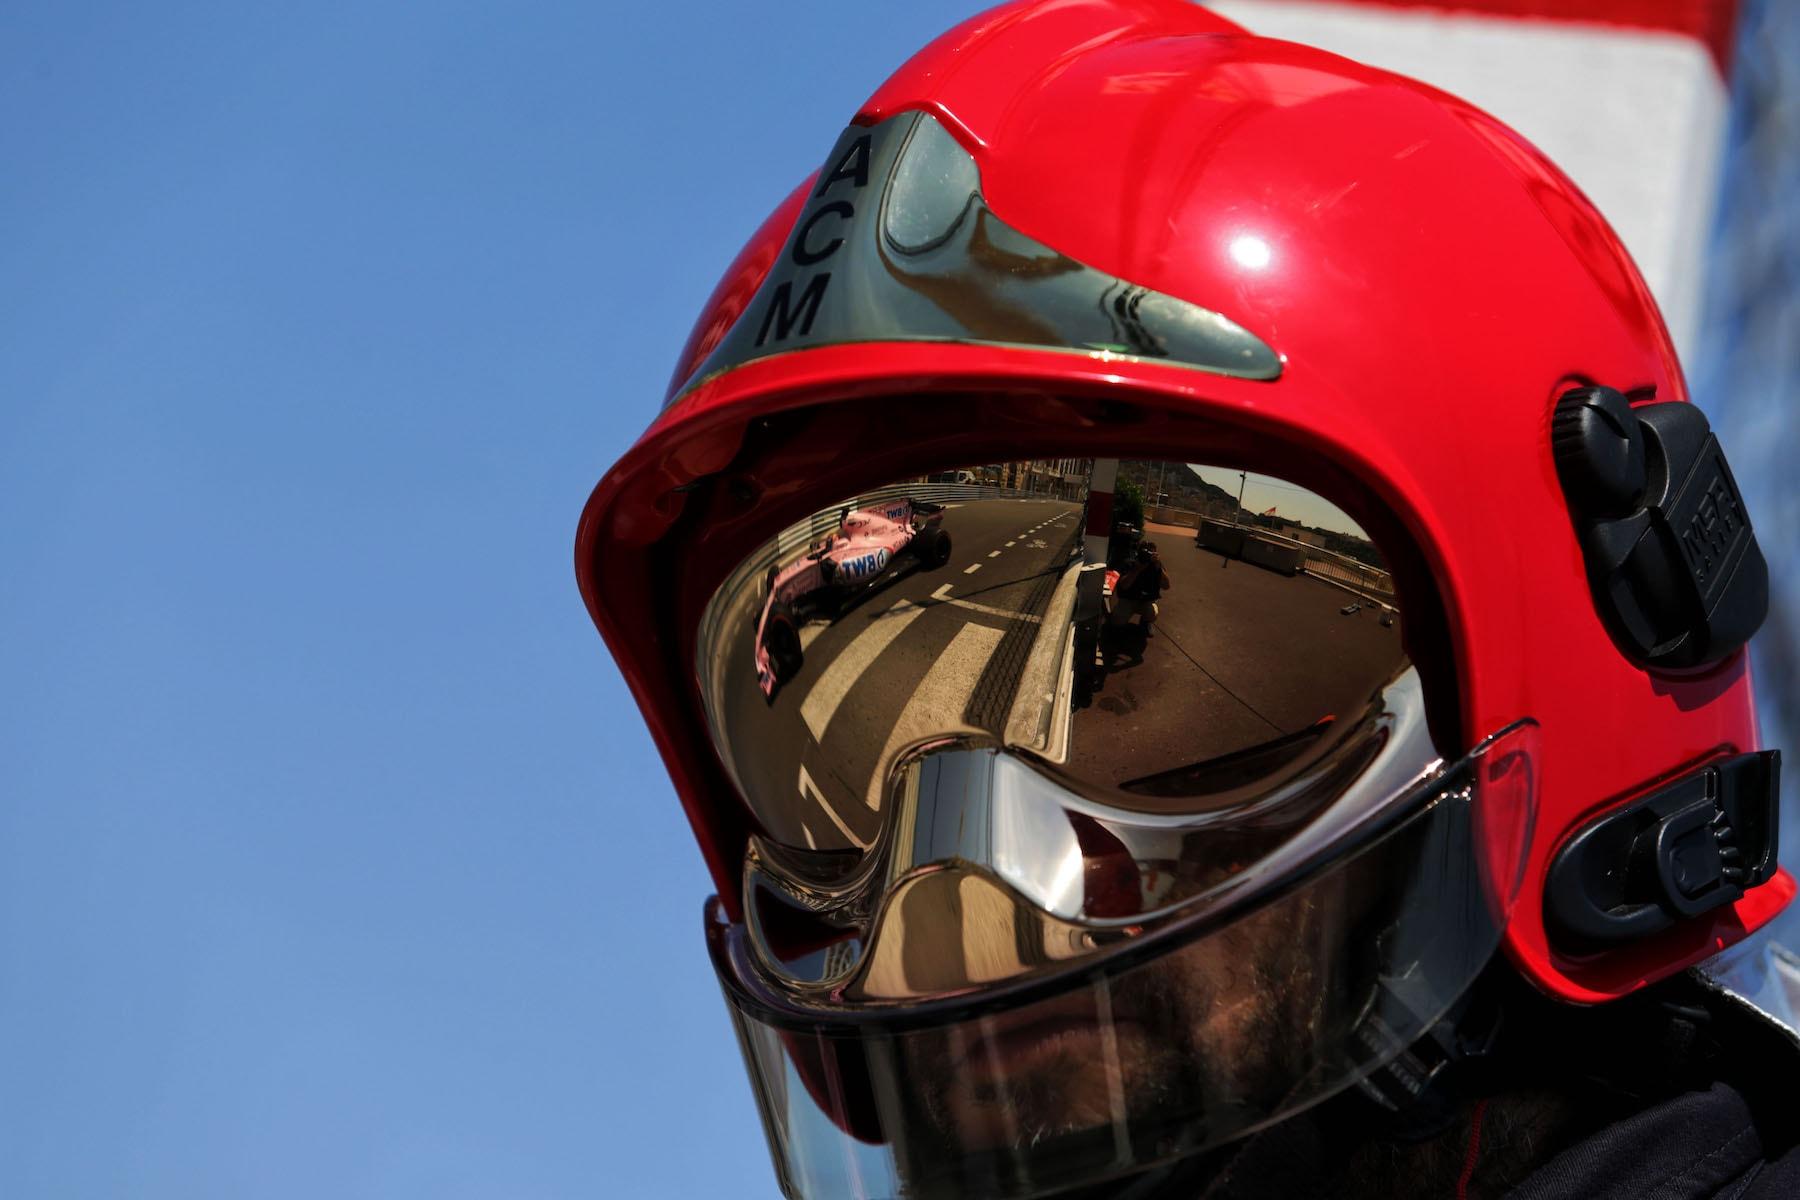 B 2017 Monaco GP ACM helmet 1 copy.jpg